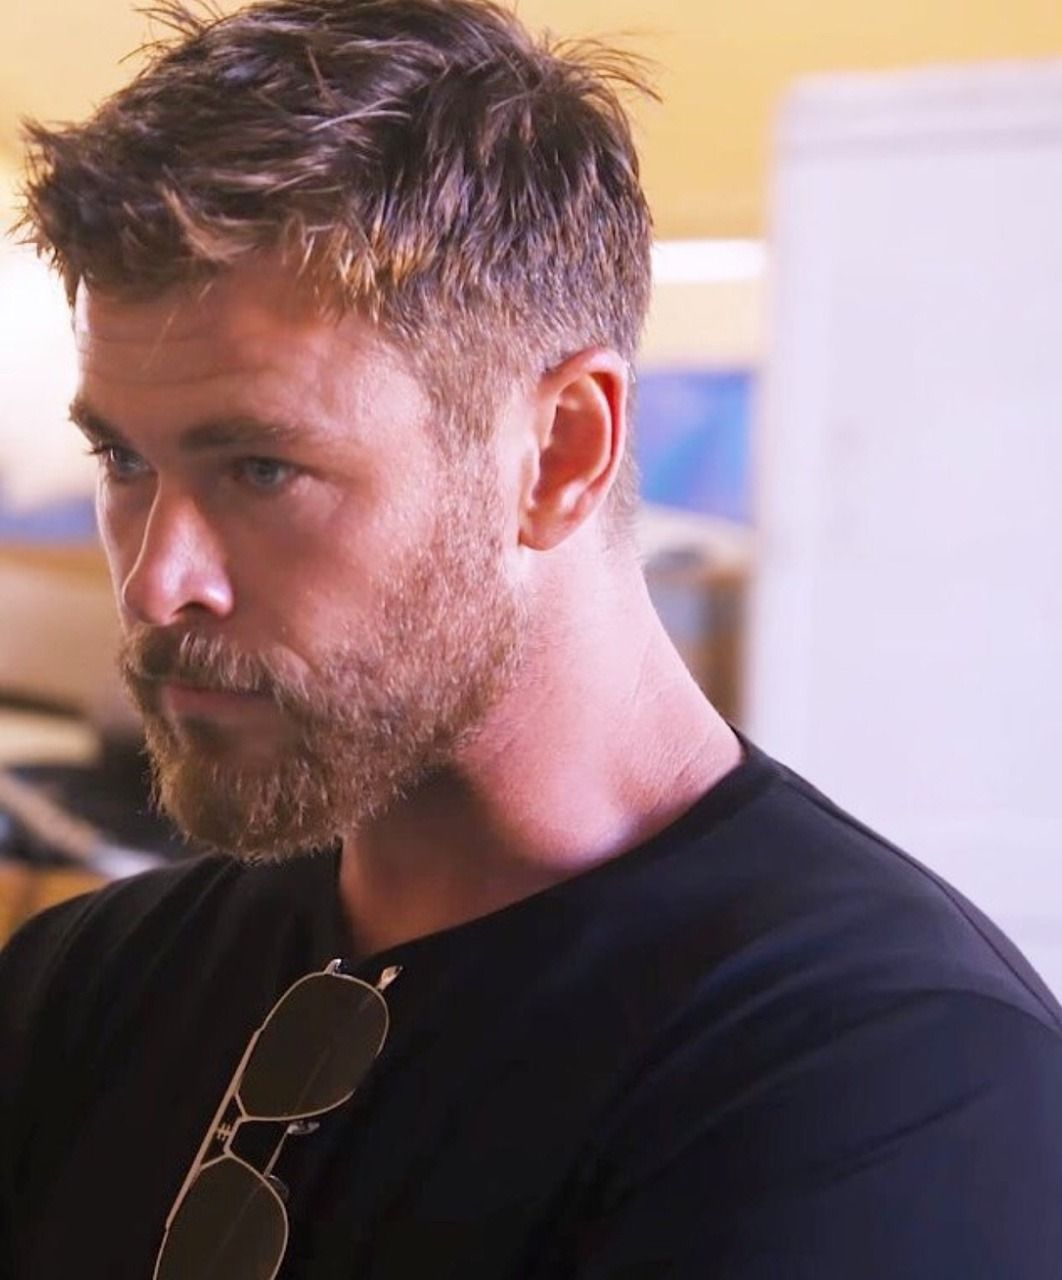 He Blows My Mind Mens Haircuts Short Mens Hairstyles Short Haircuts For Men